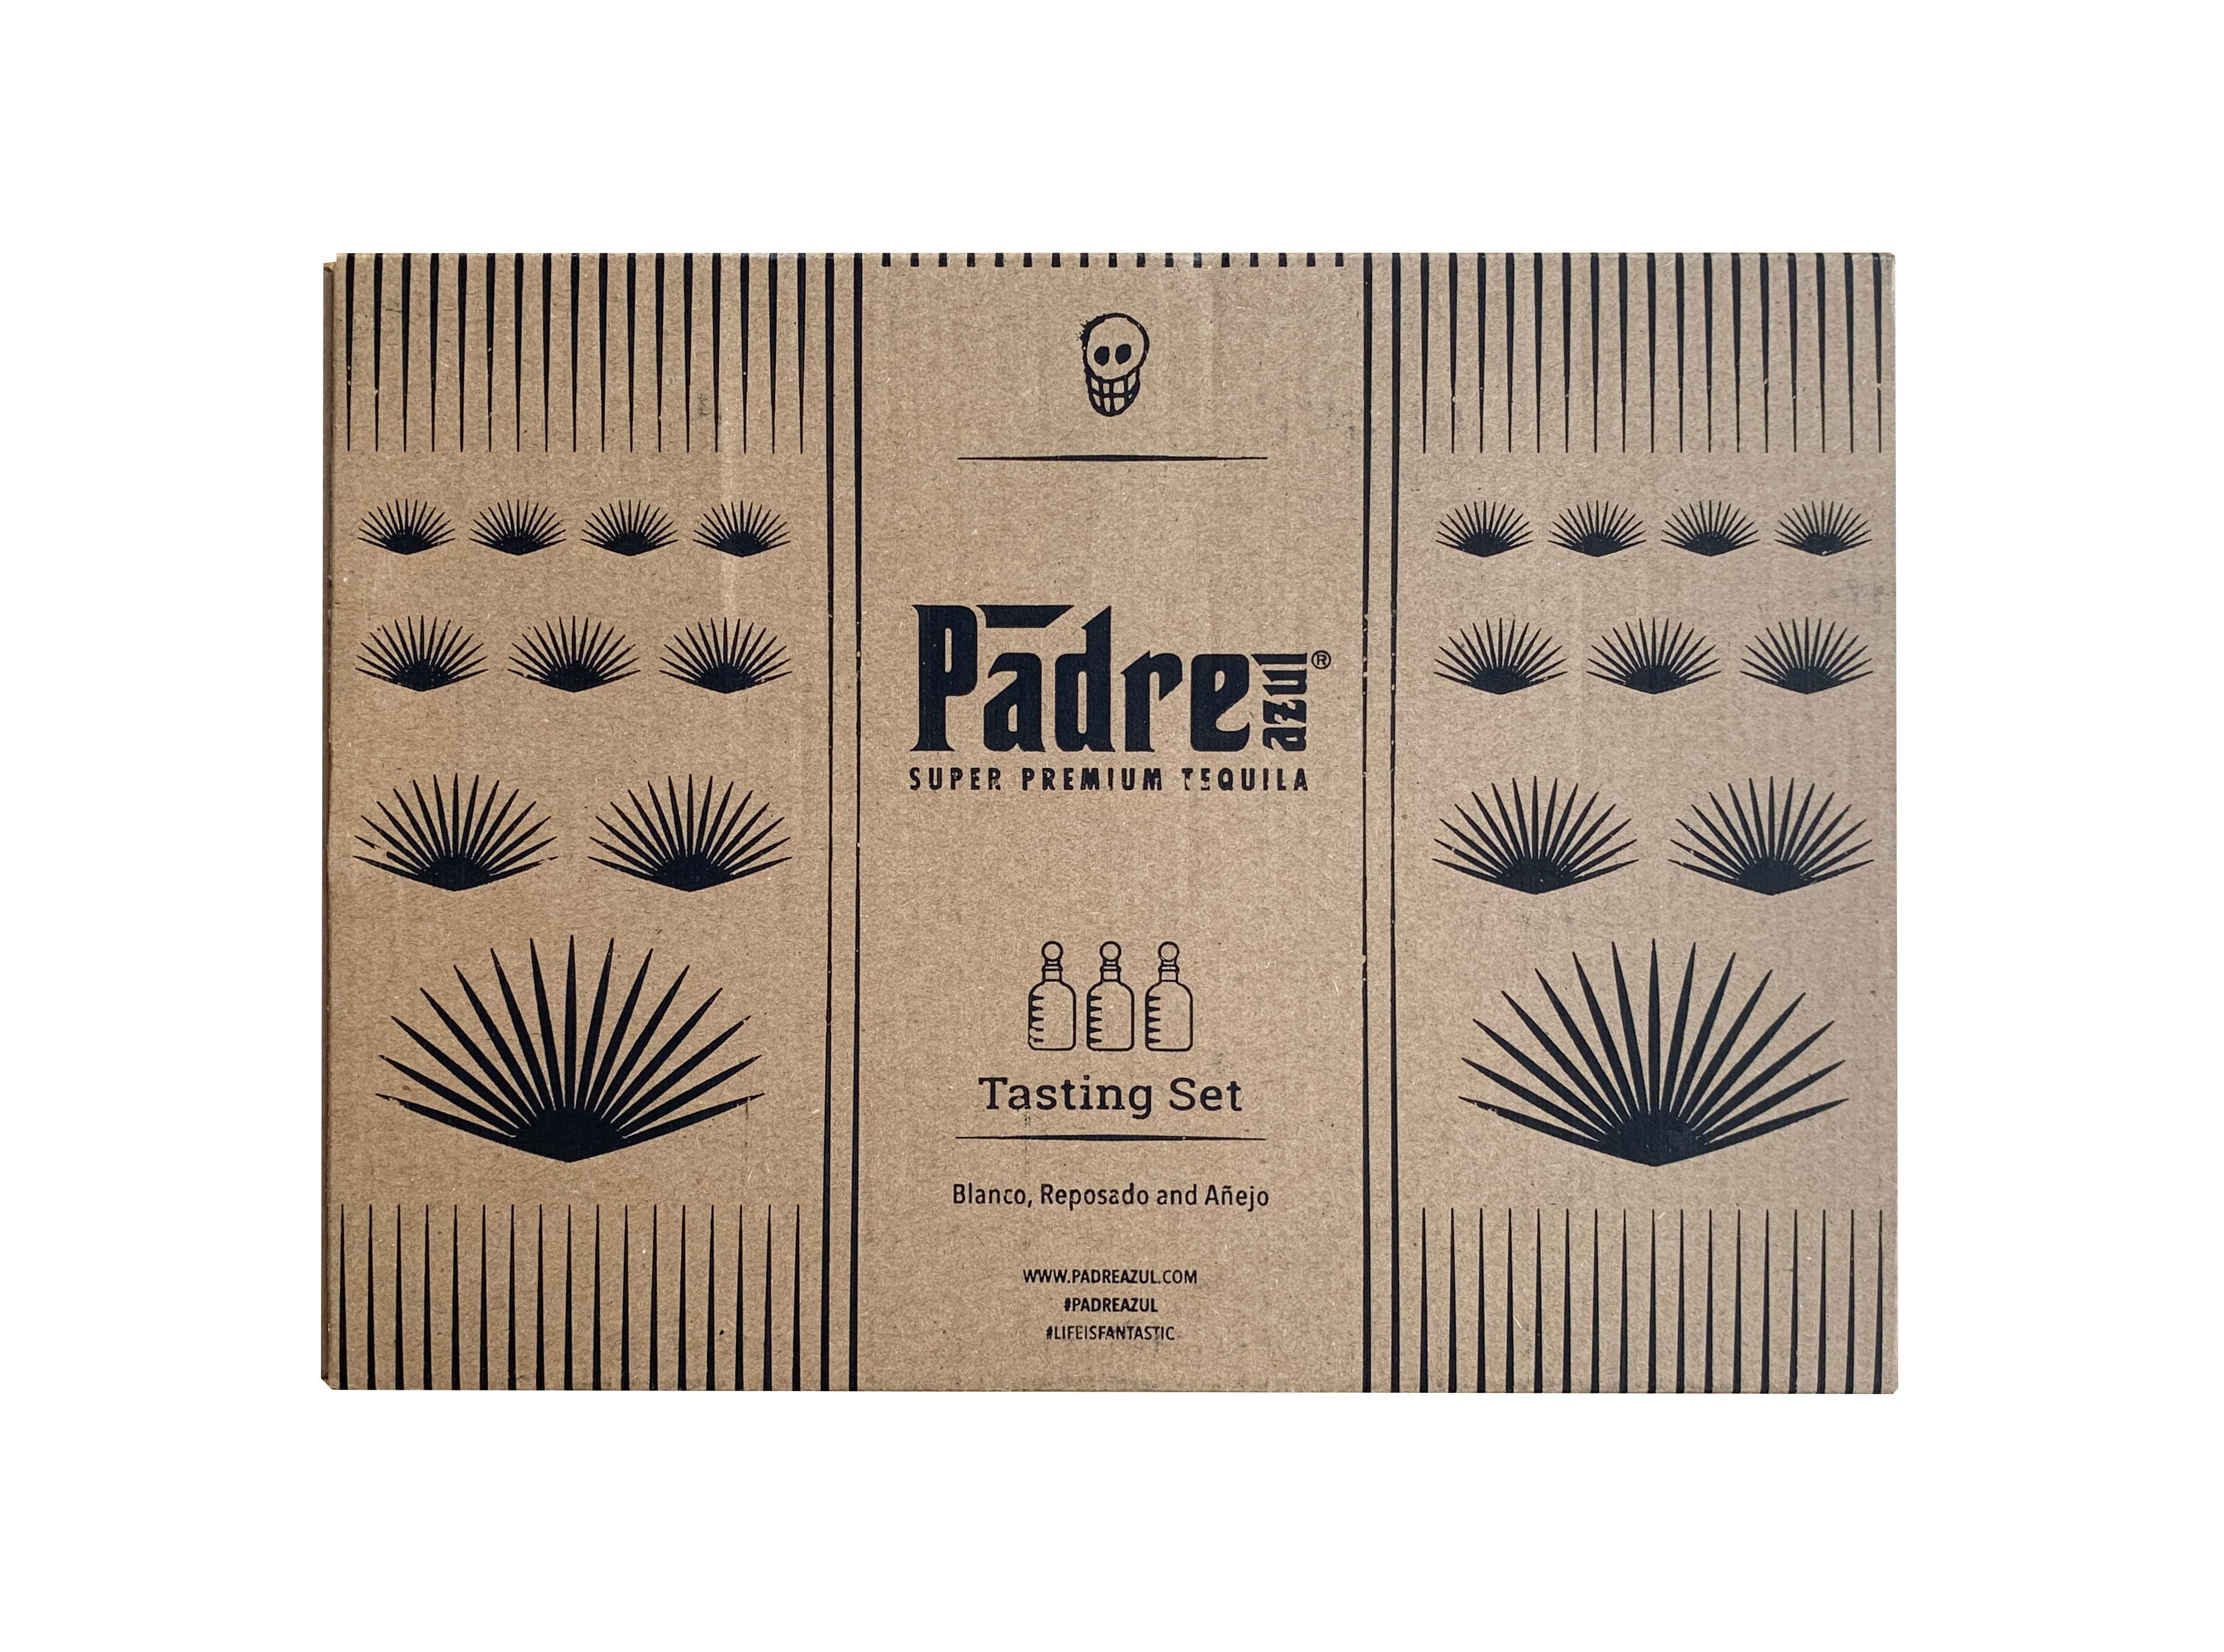 Padre Mini Tasting Box Trio